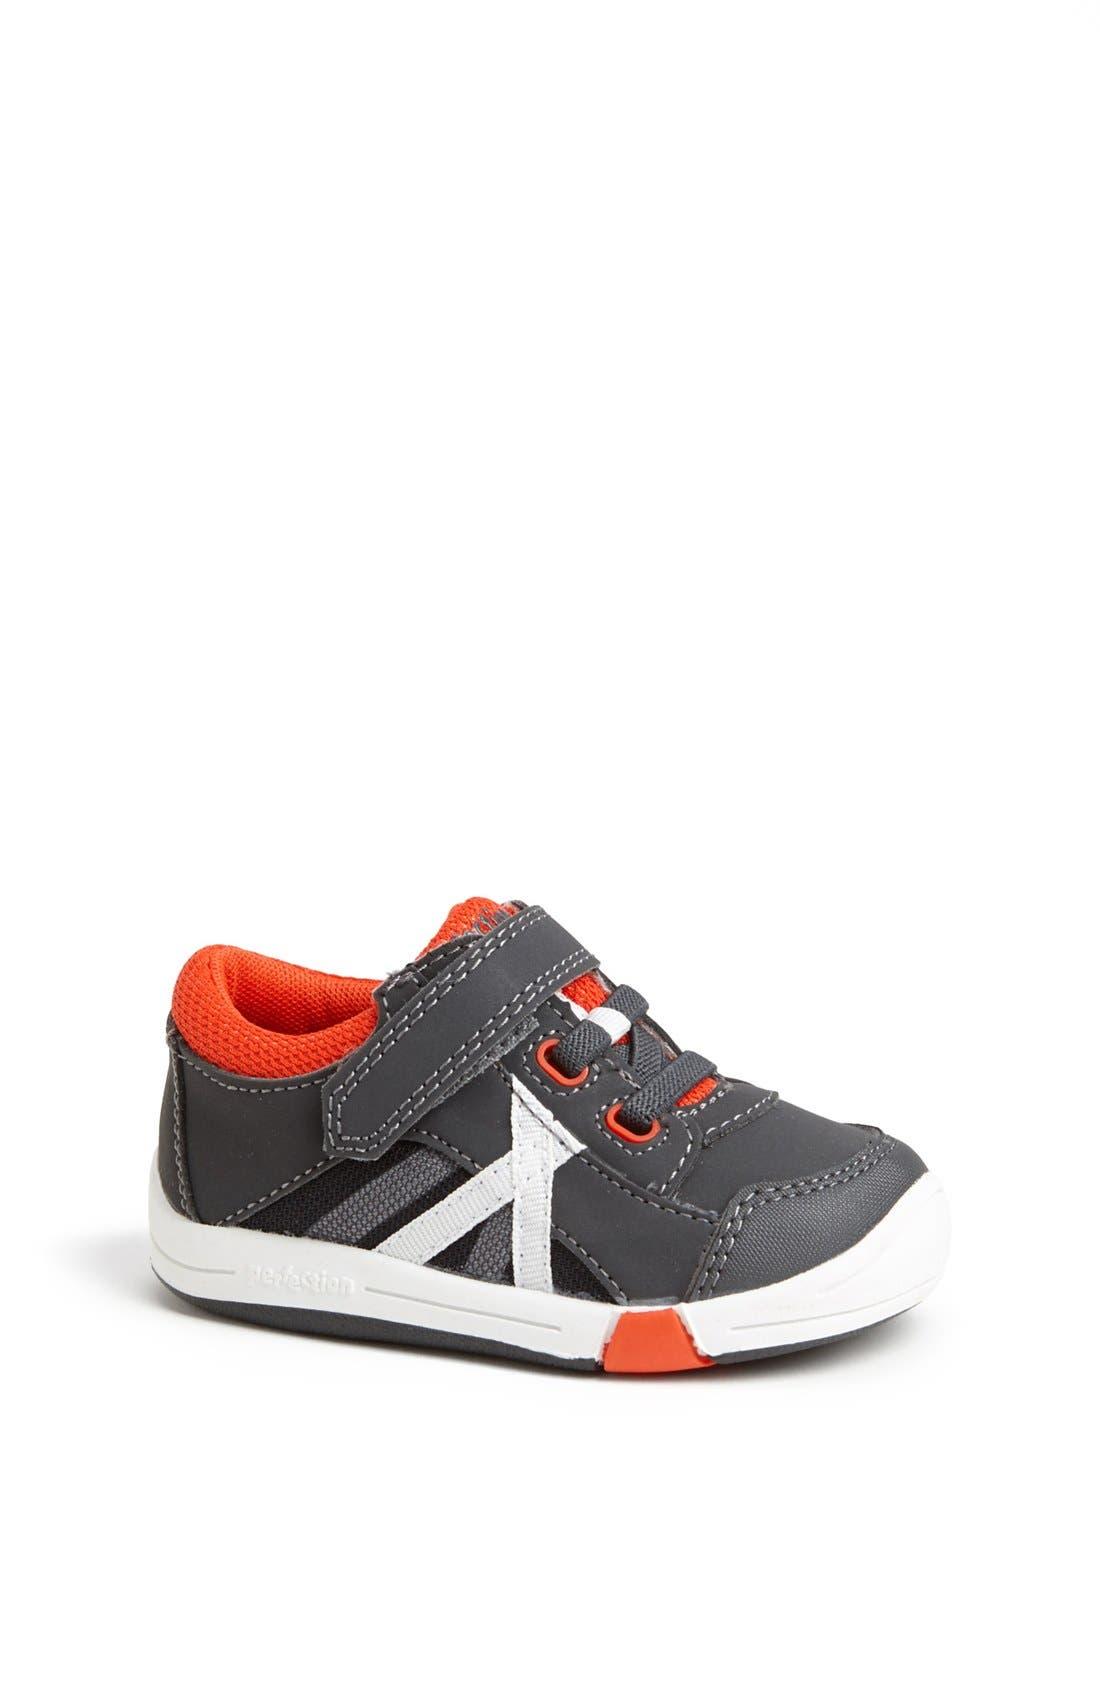 Alternate Image 1 Selected - Jumping Jacks 'Finish Line' Sneaker (Baby, Walker & Toddler)